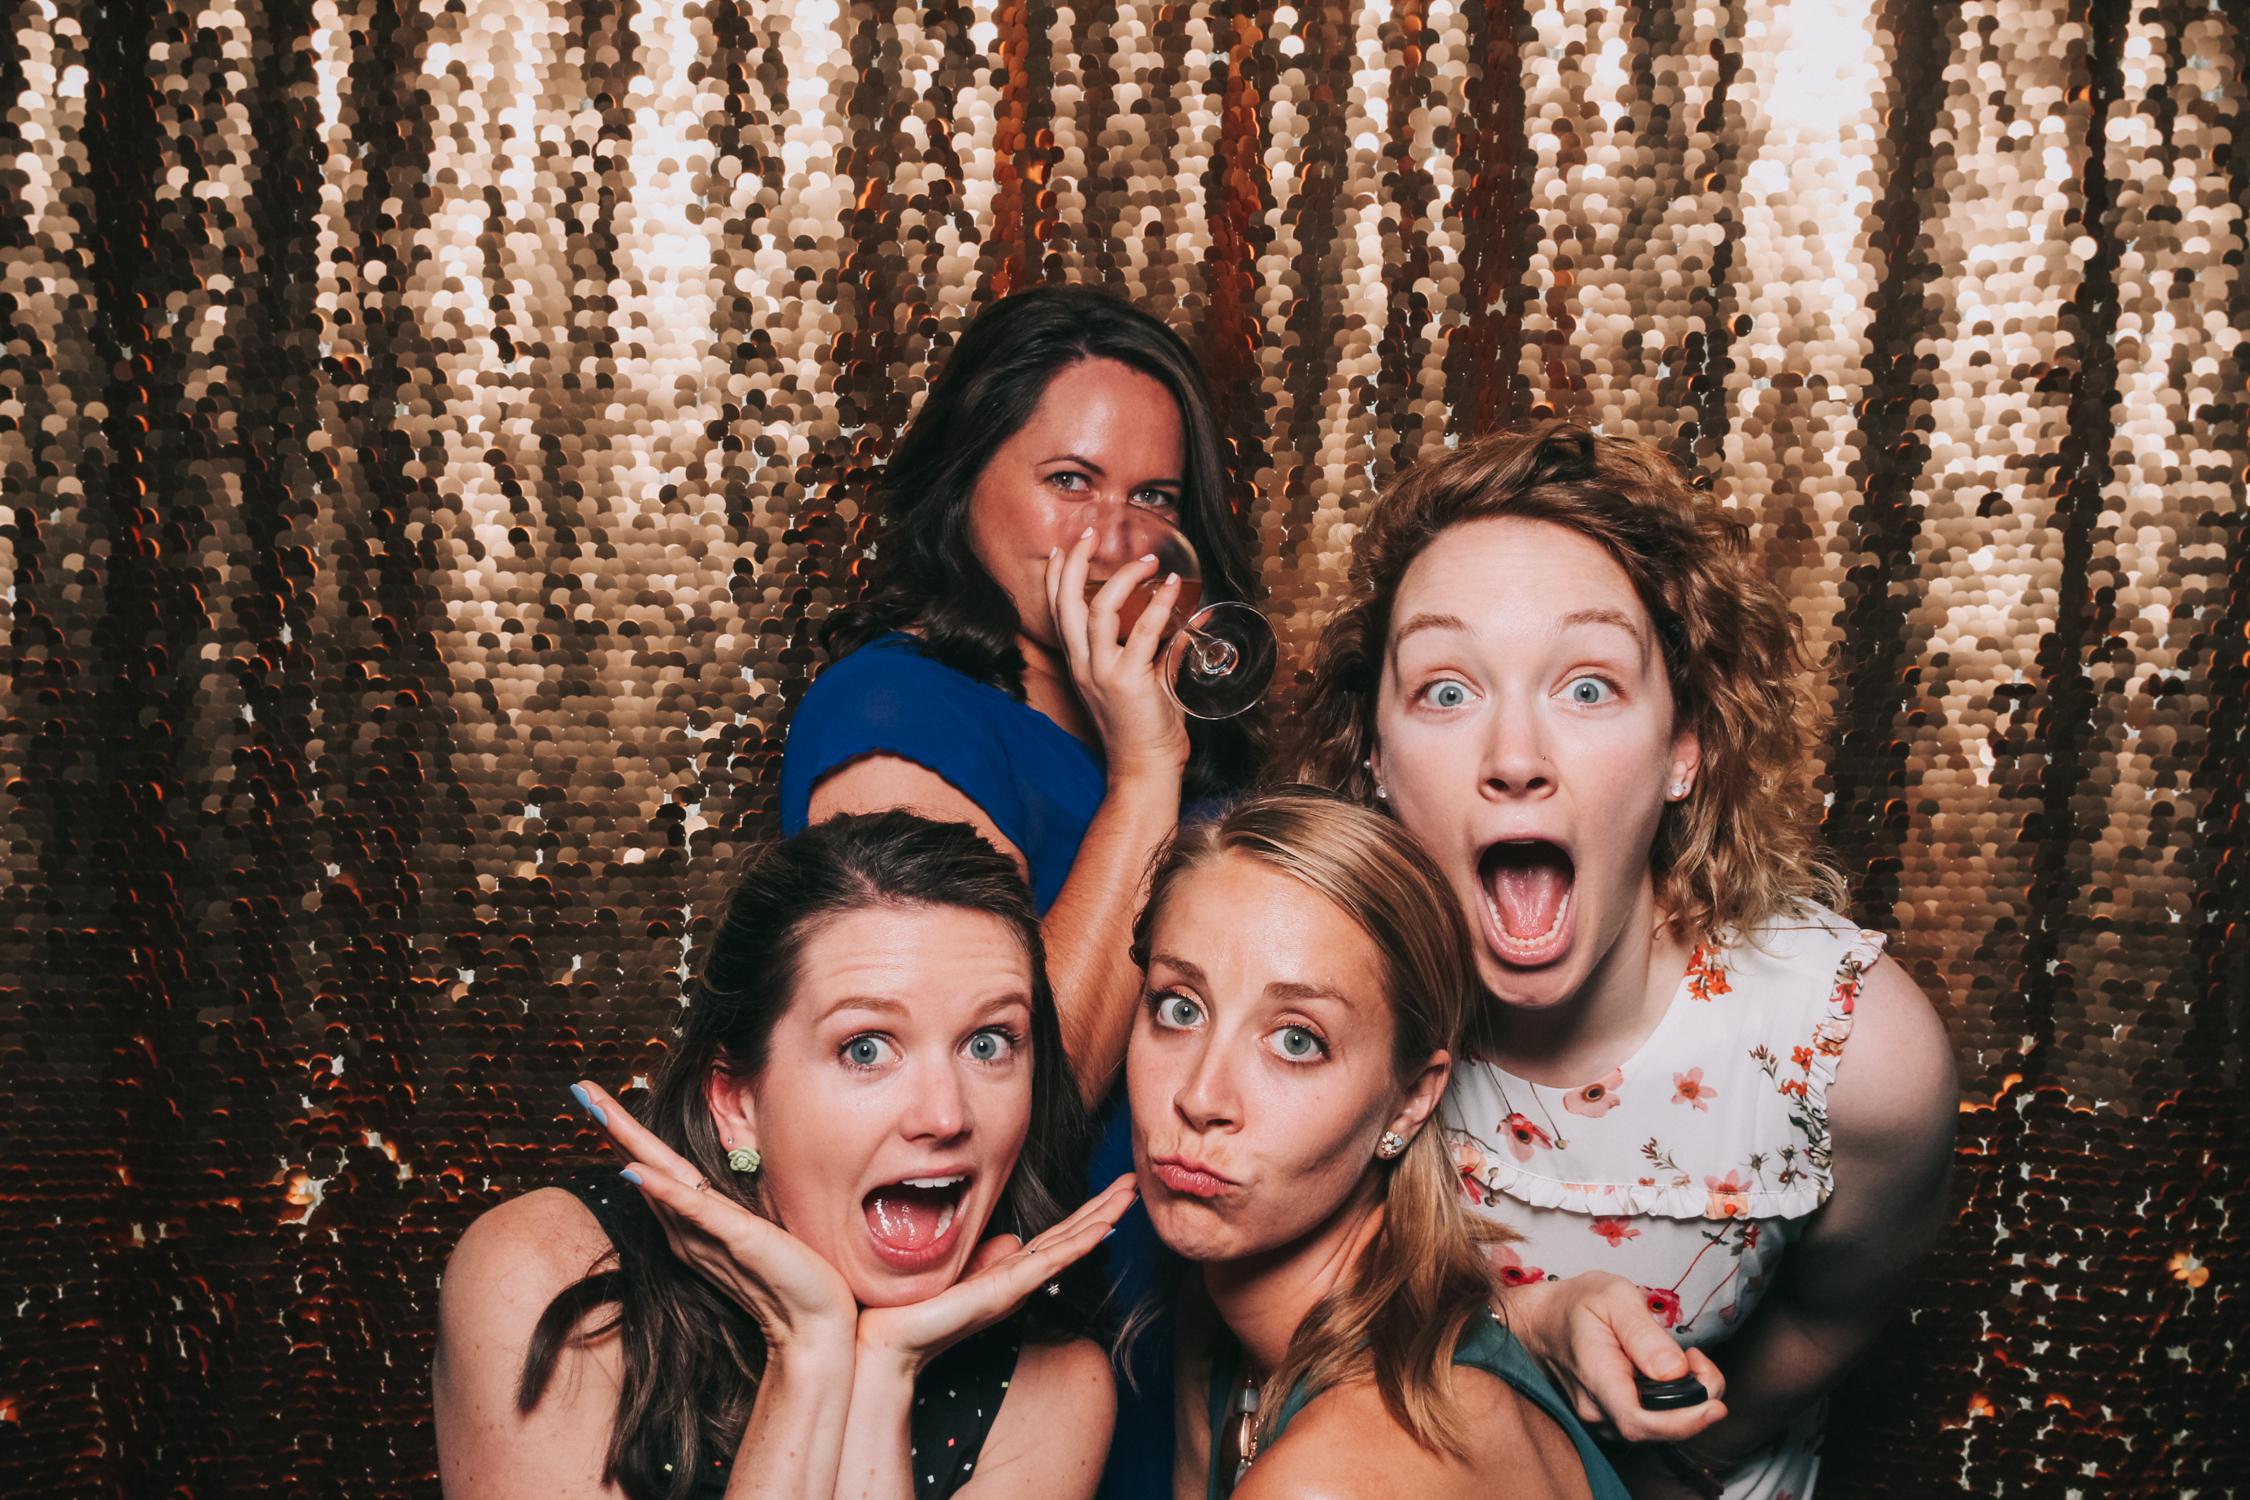 baltimore rusty scupper wedding photo booth-15.jpg